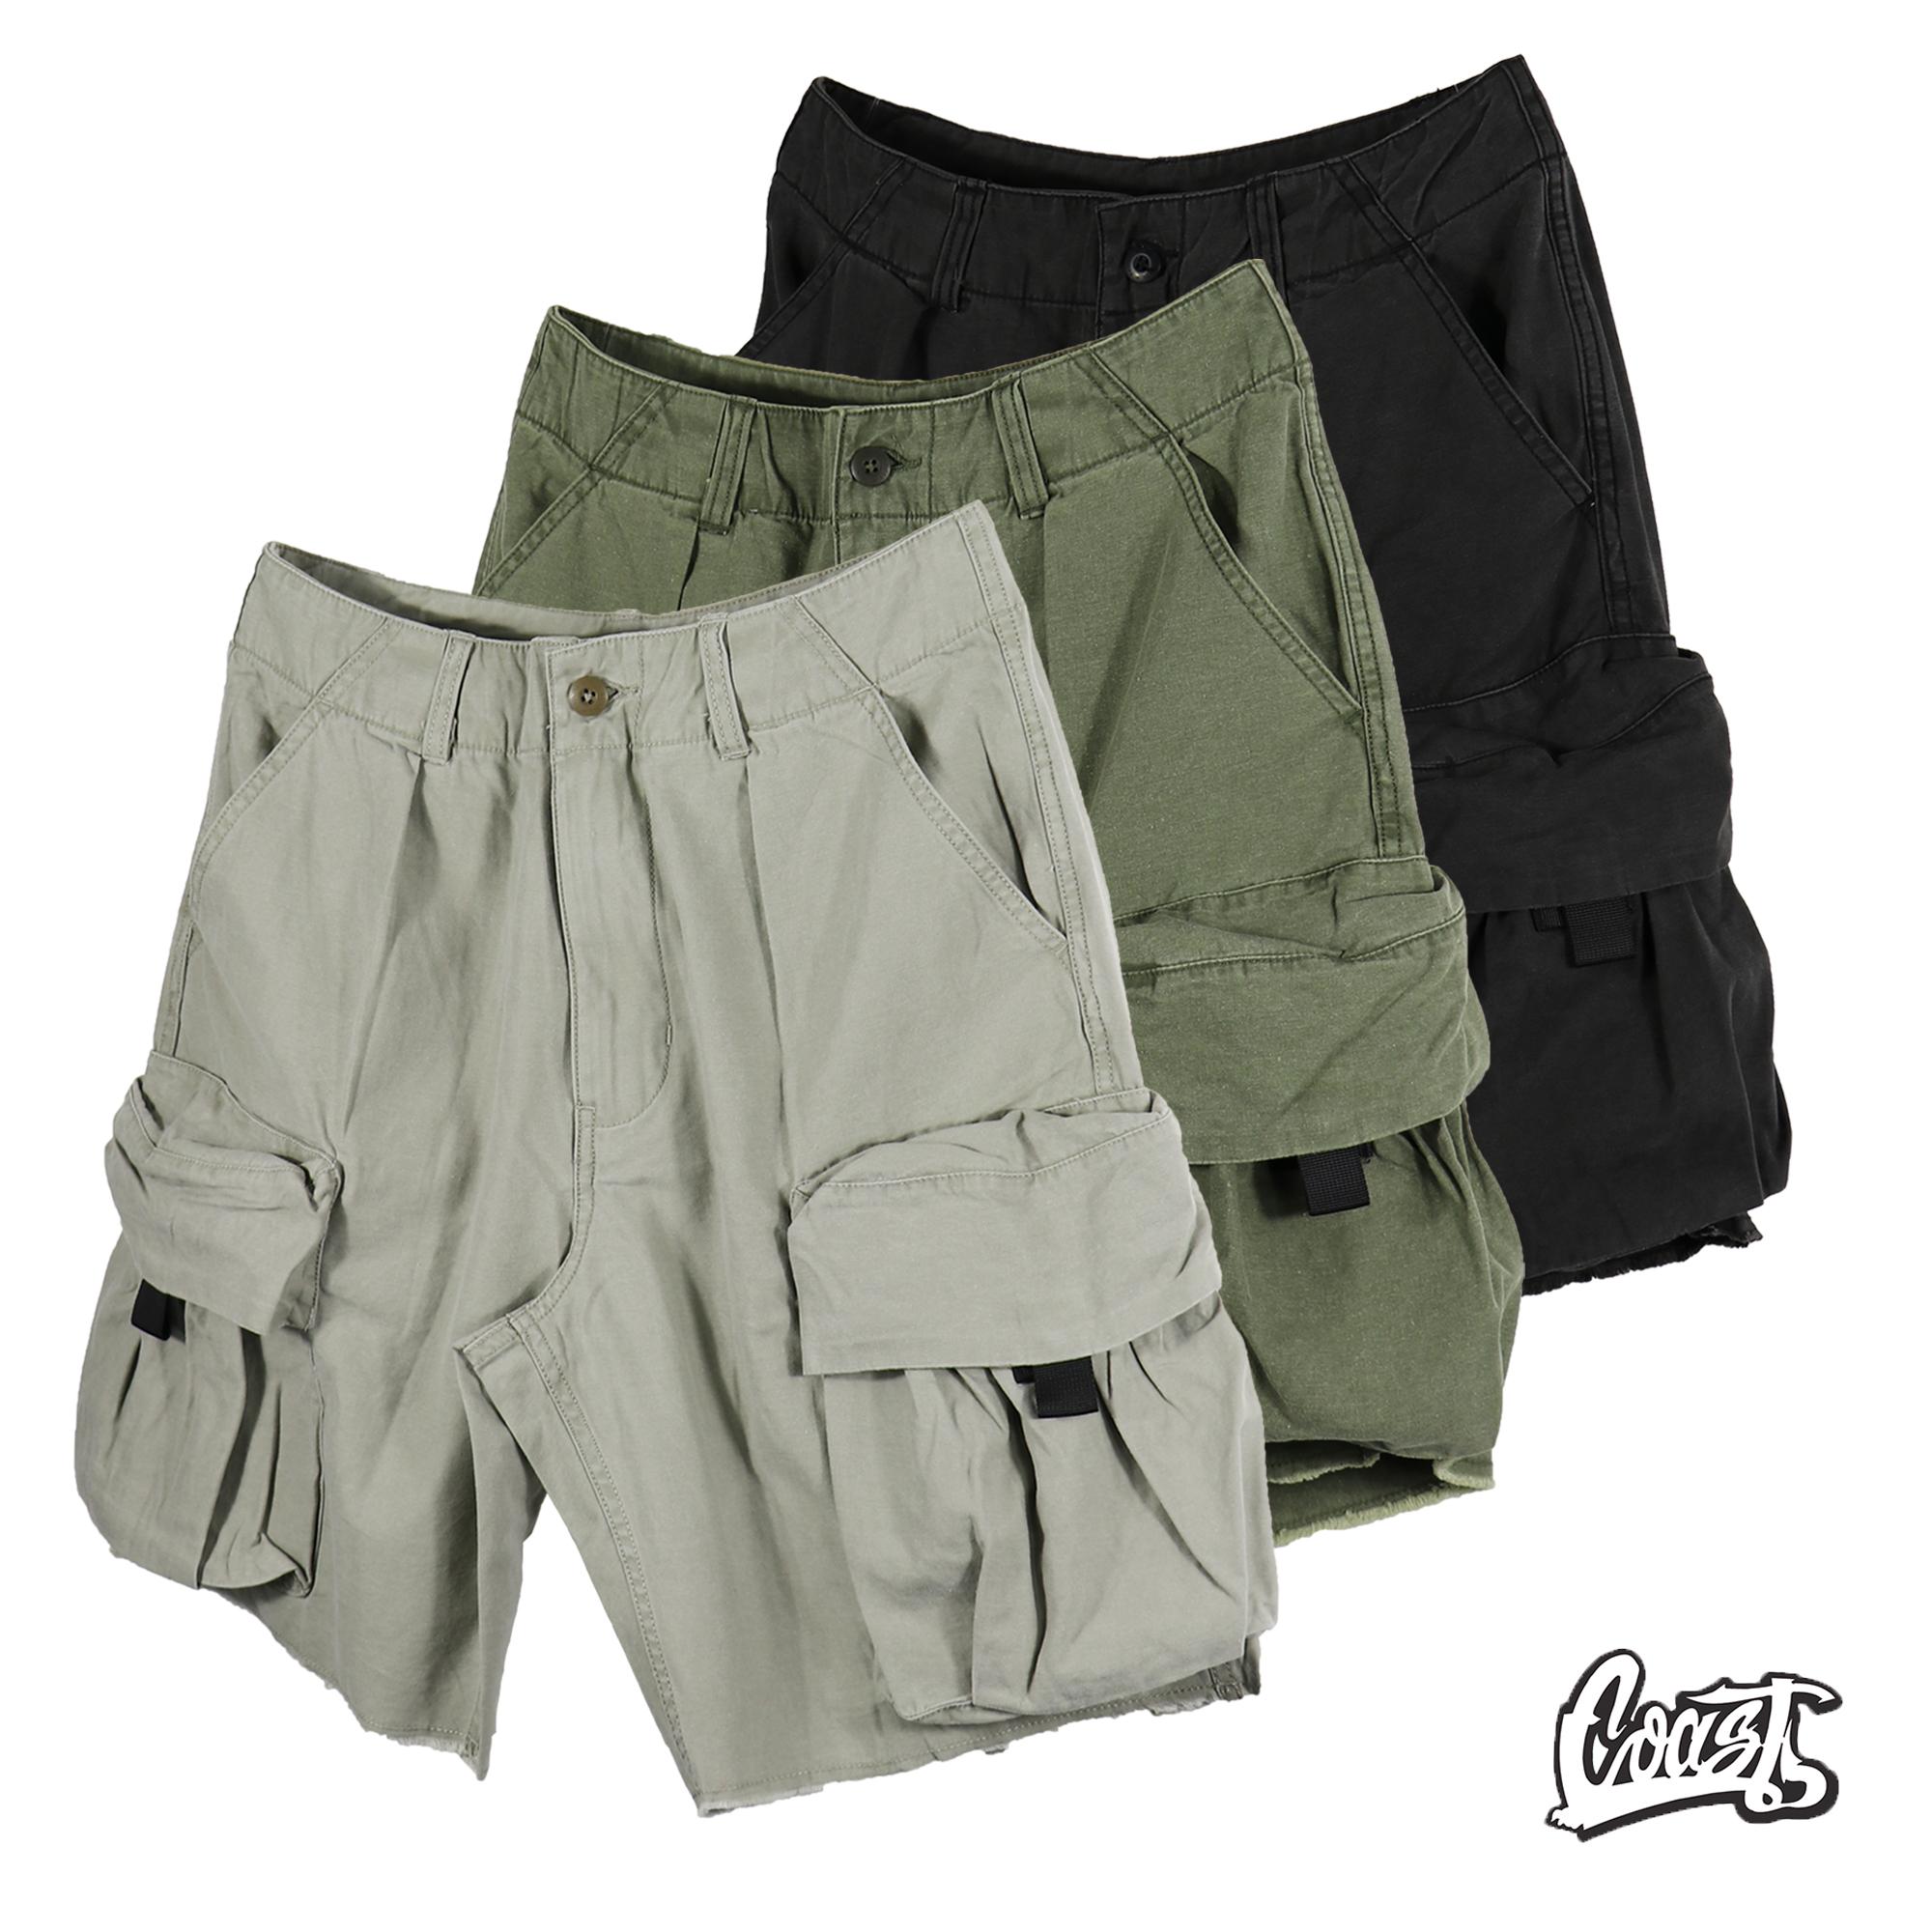 MADNESS ARMY SHORTS 20SS 水洗工装口袋短裤男休闲五分裤 余文乐